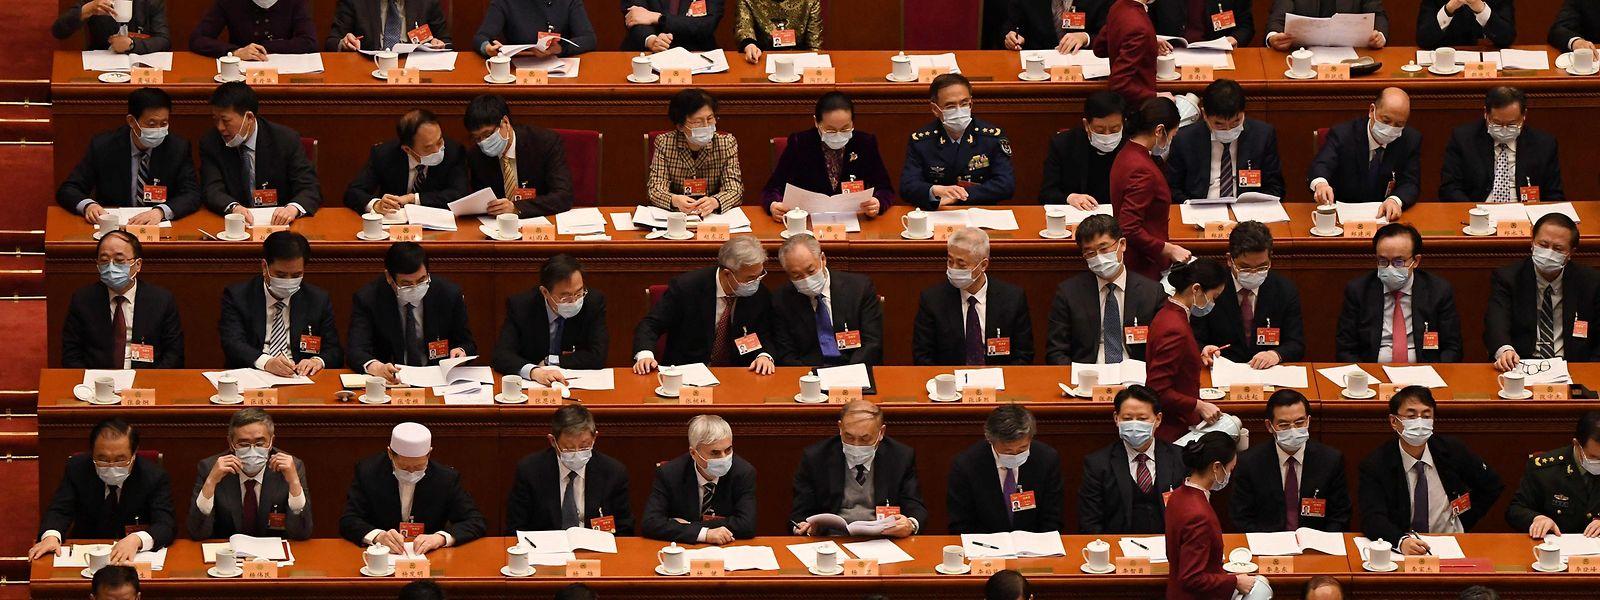 Der Volkskongress tagt in Peking -trotz Corona.